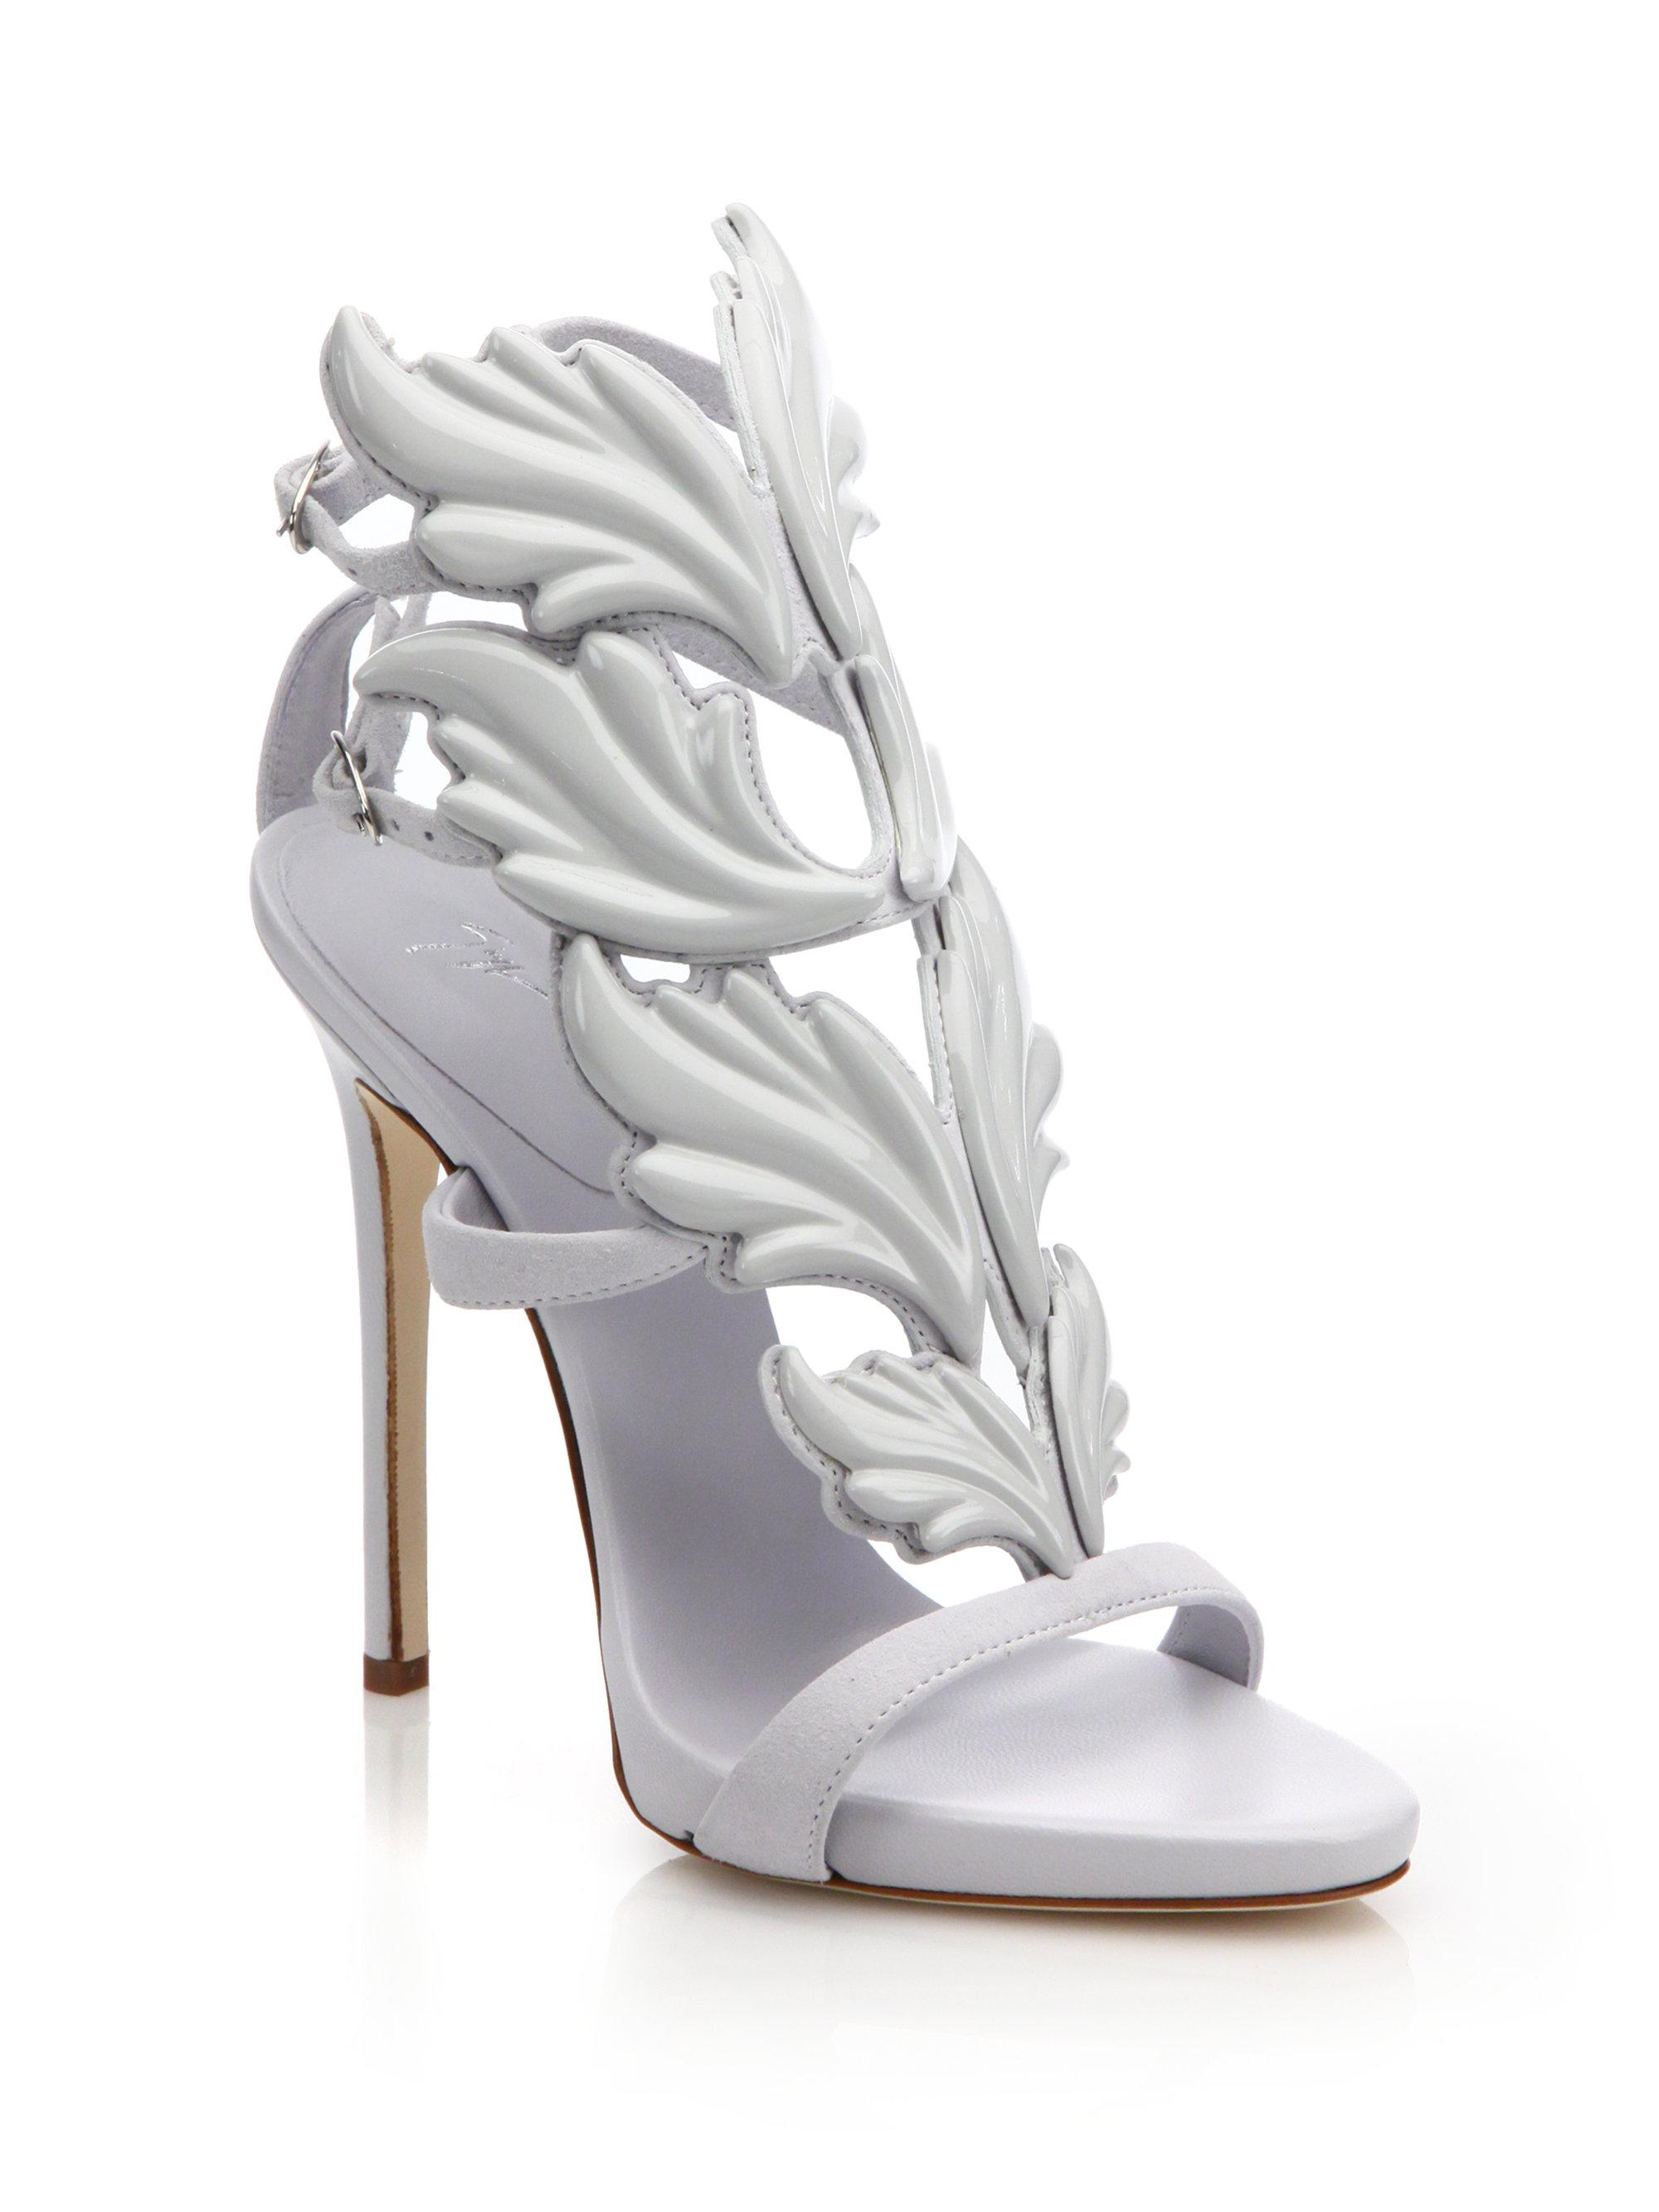 Lyst - Giuseppe zanotti Cruel Suede Wing Sandals in Metallic